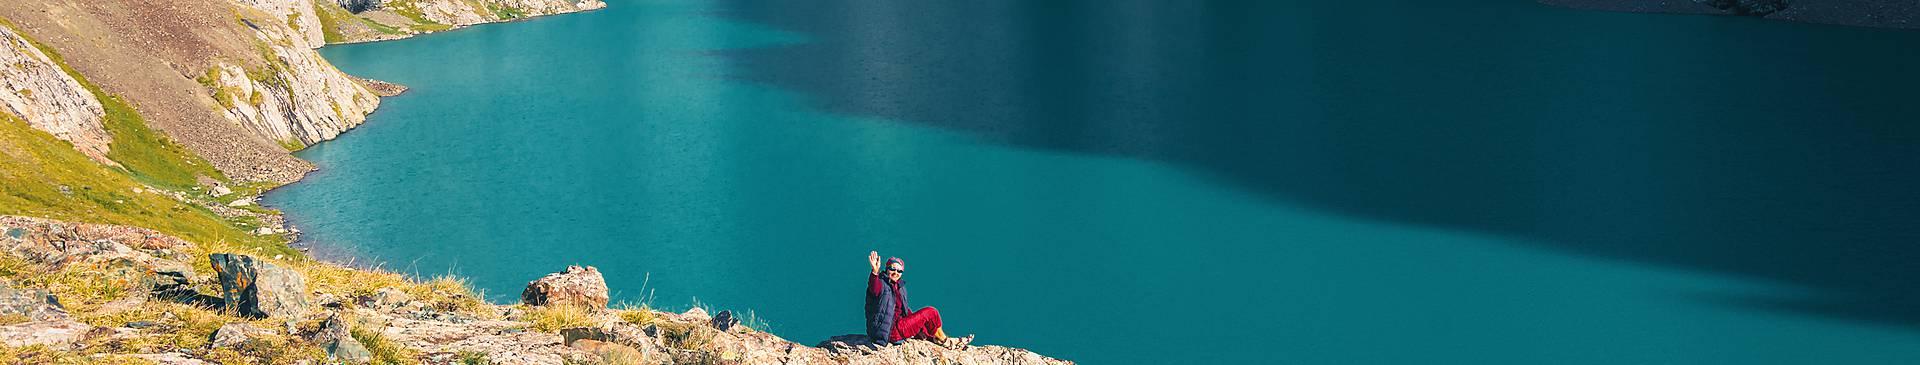 Bergurlaub Kirgistan